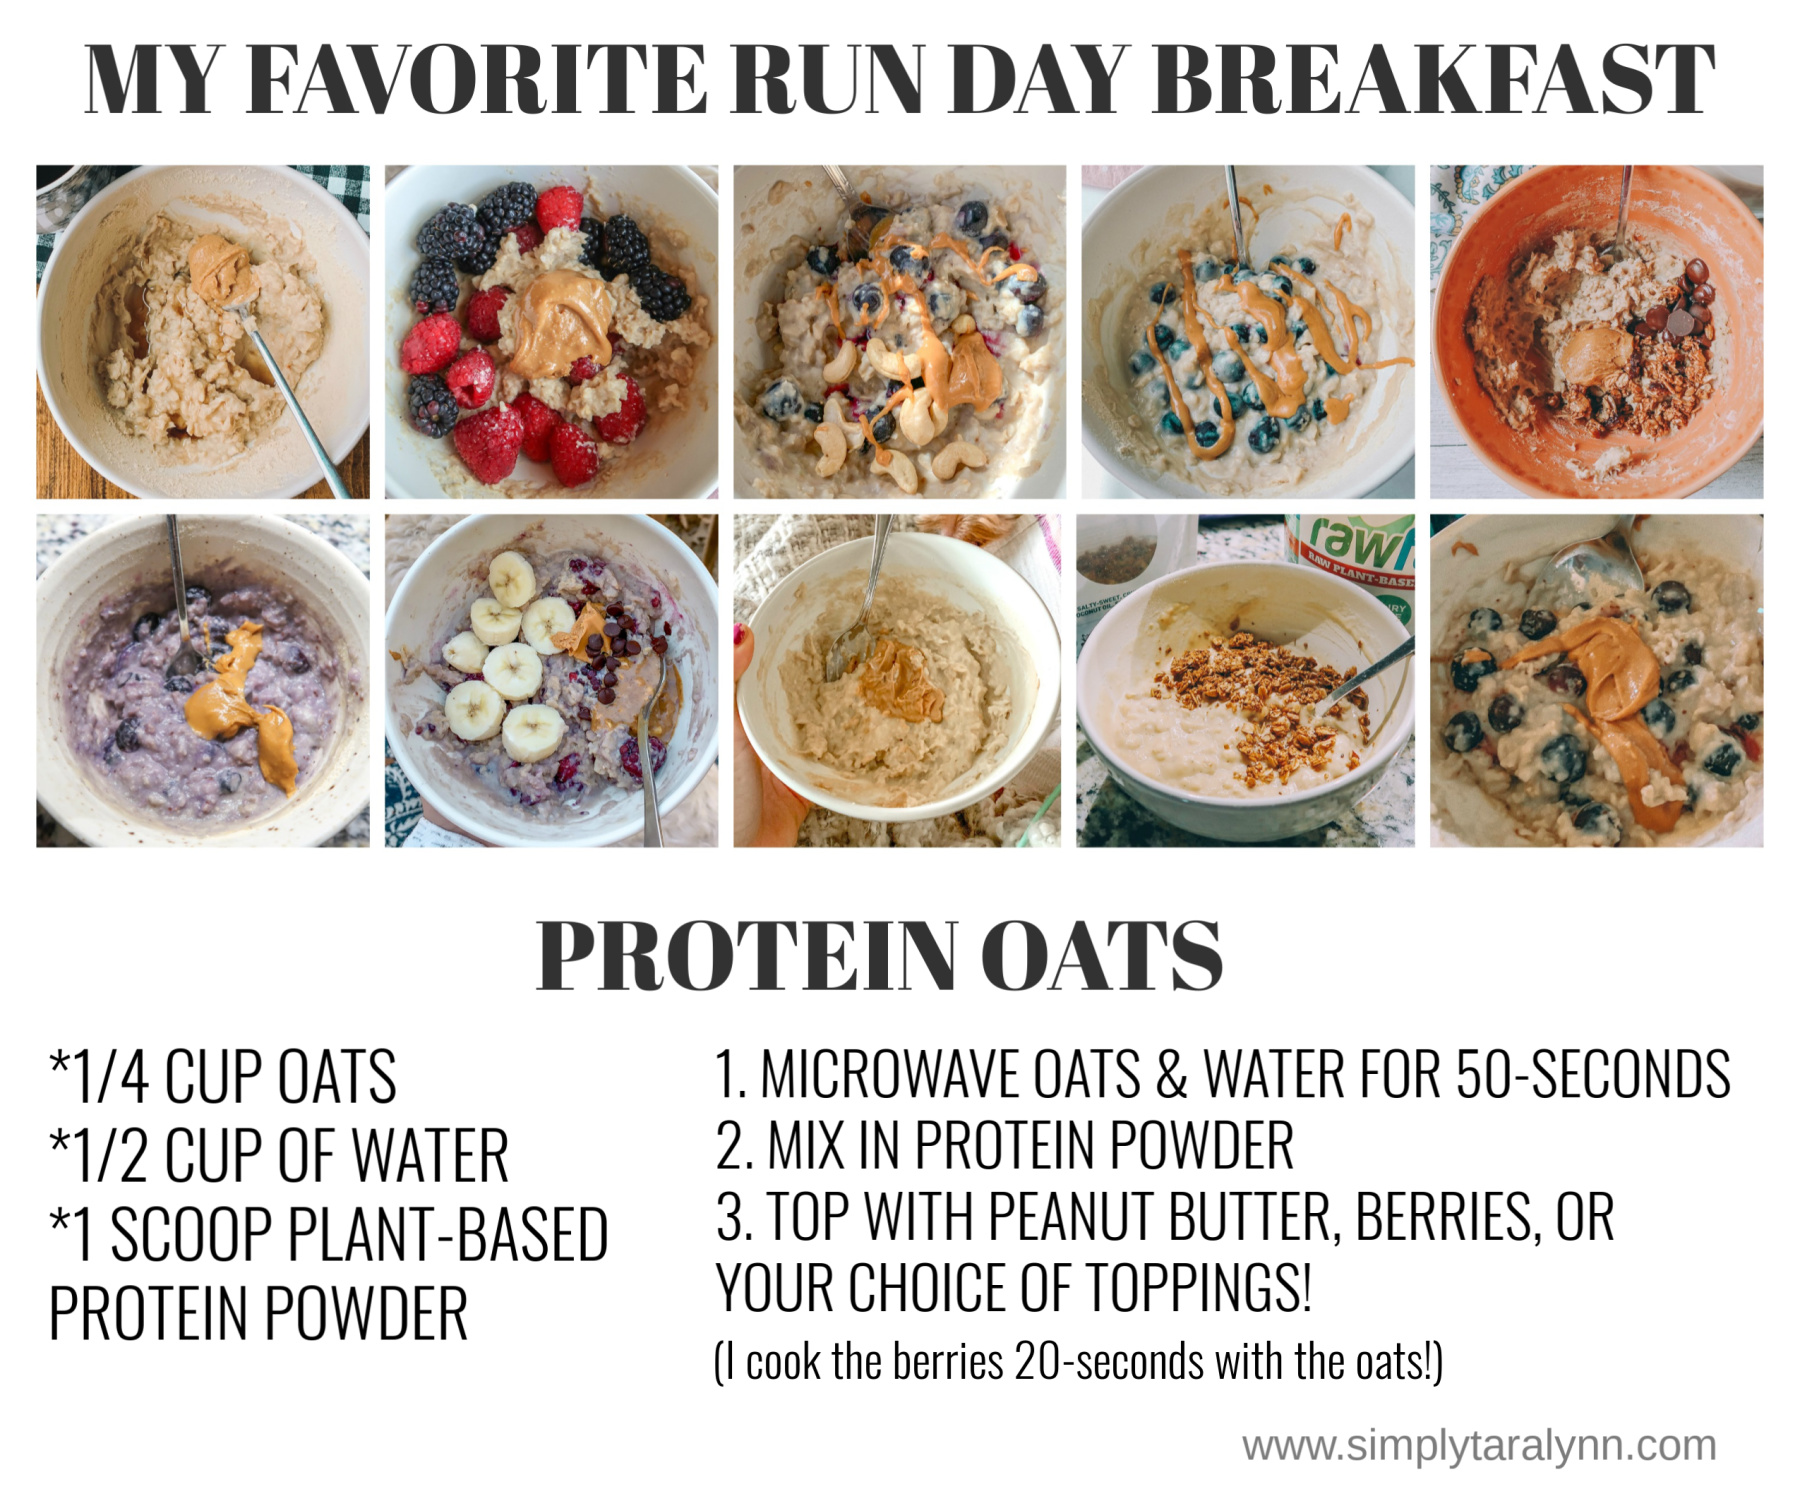 running training 5k breakfast pre-run fuel healthy My couch to 5k training plan running 3 miles run fitness calendar schedule printout taralynn